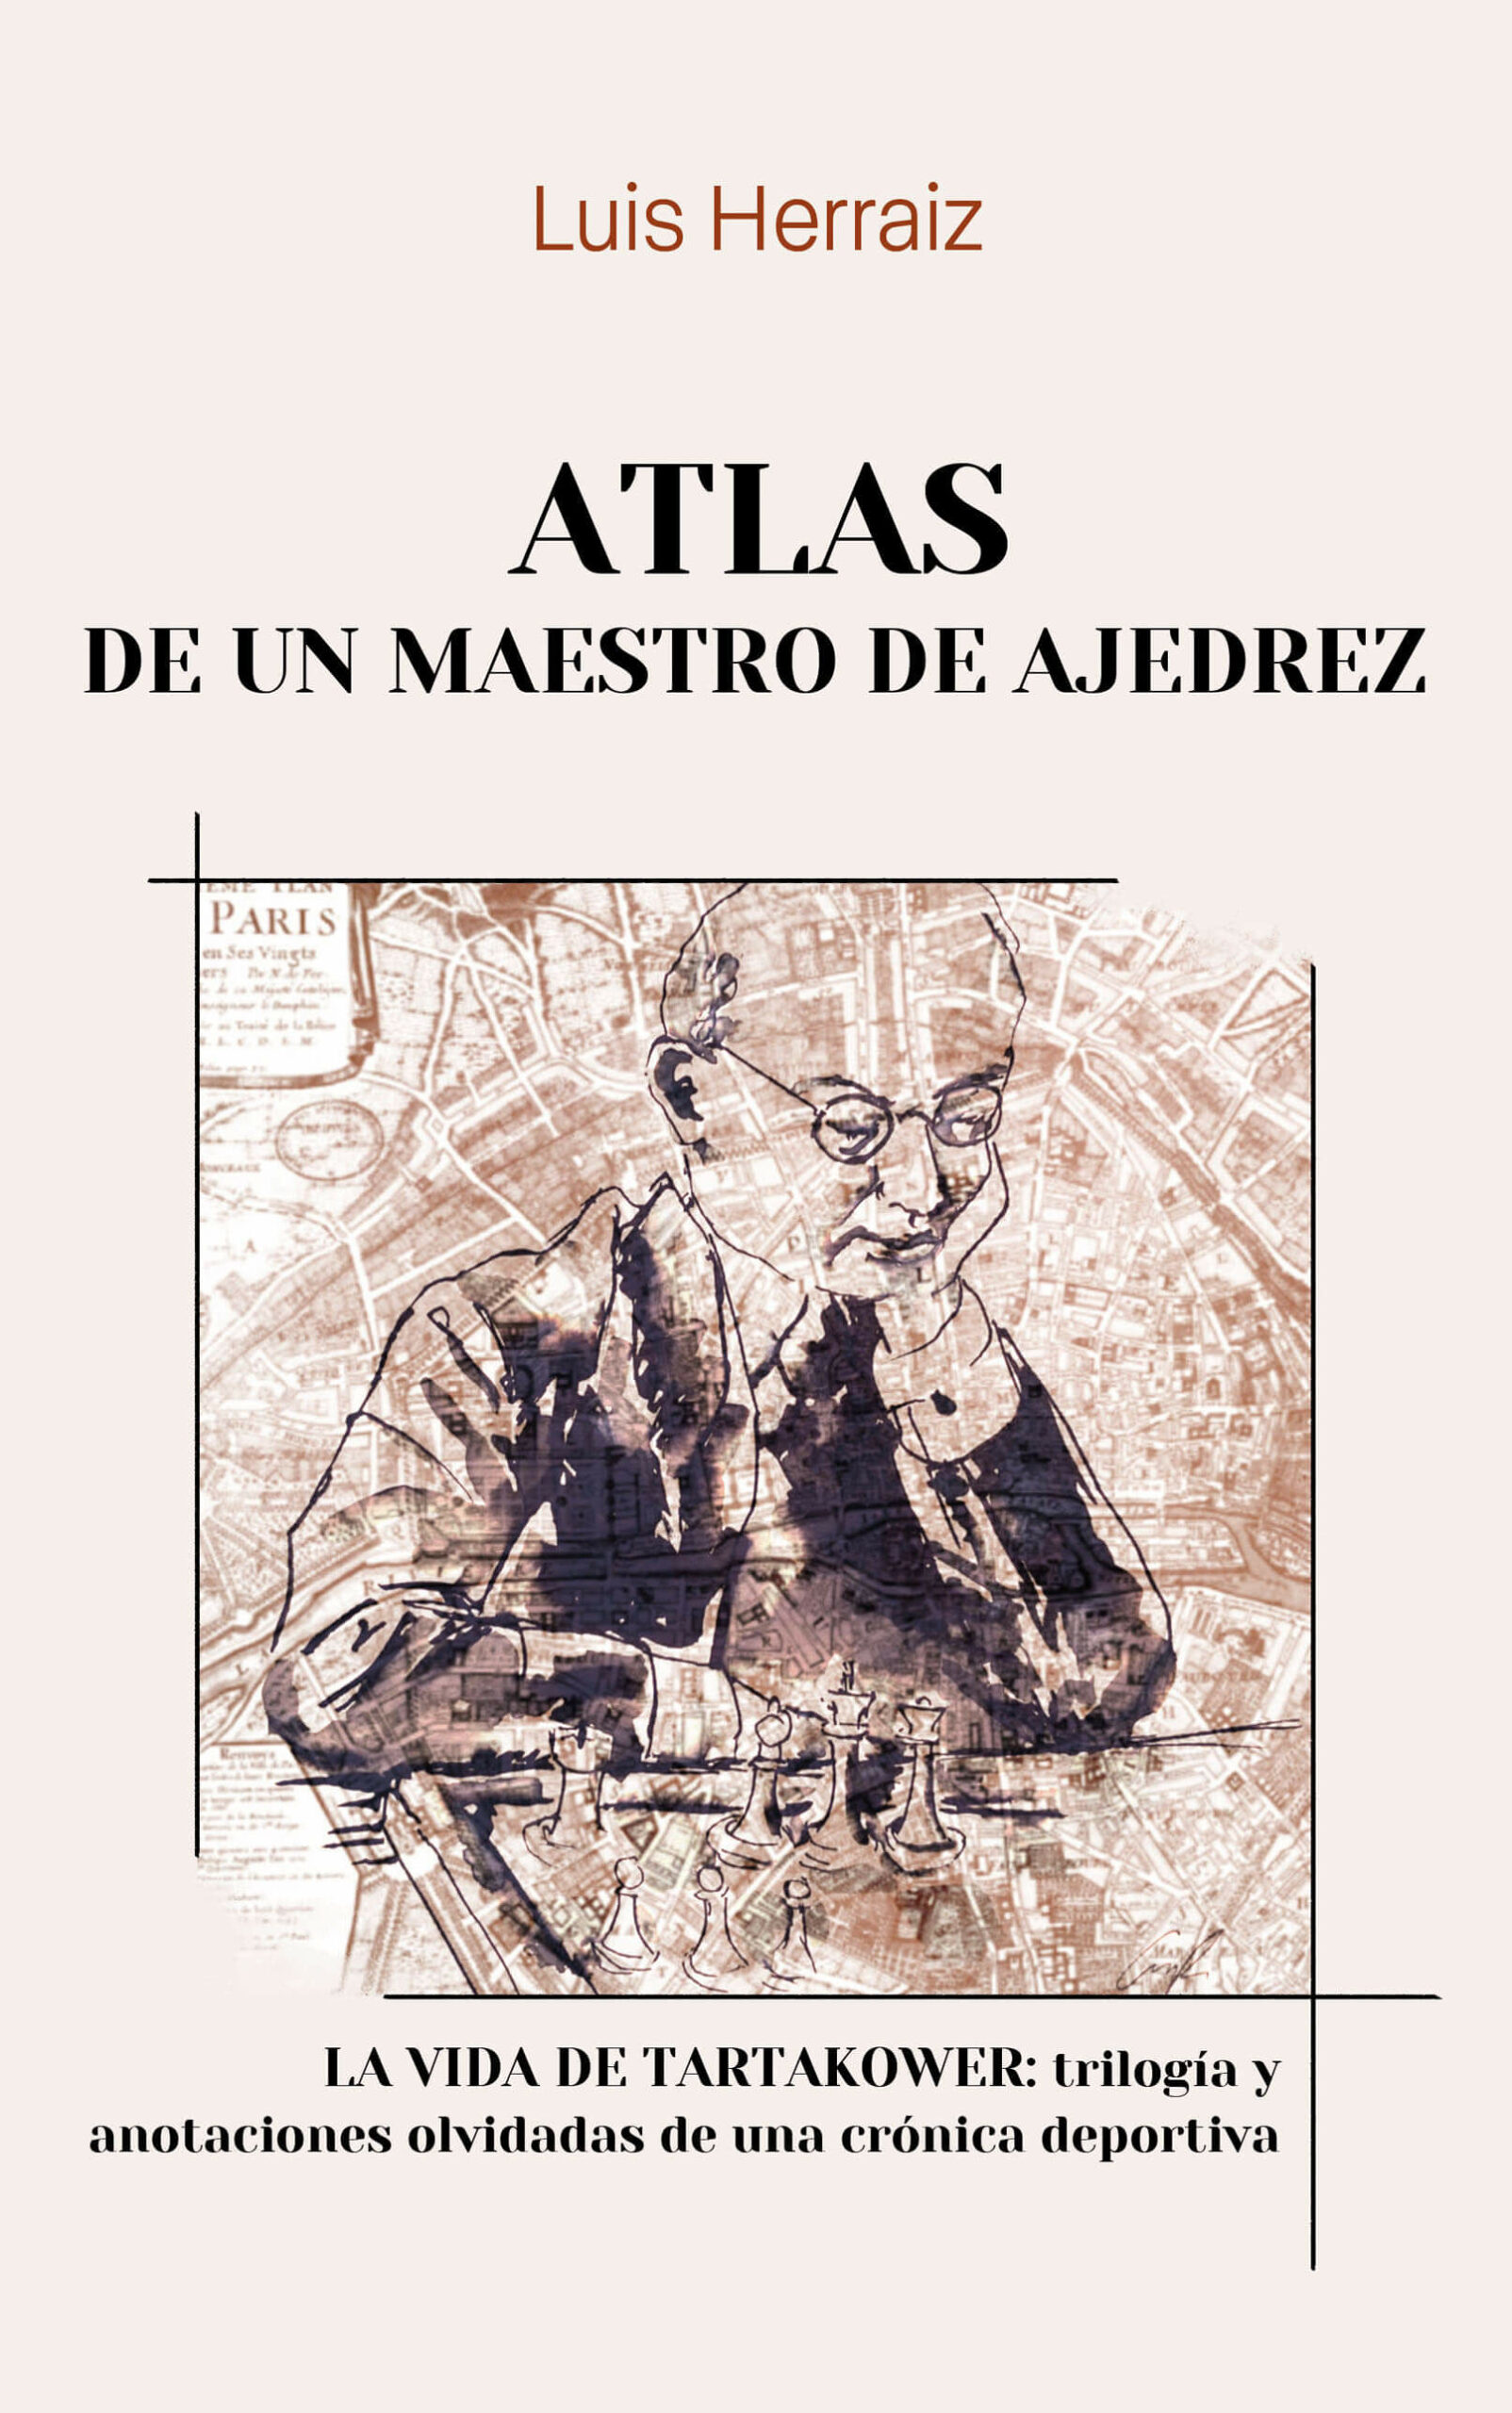 Atlas de un maestro de ajedrez, de Luis Herraiz Hidalgo